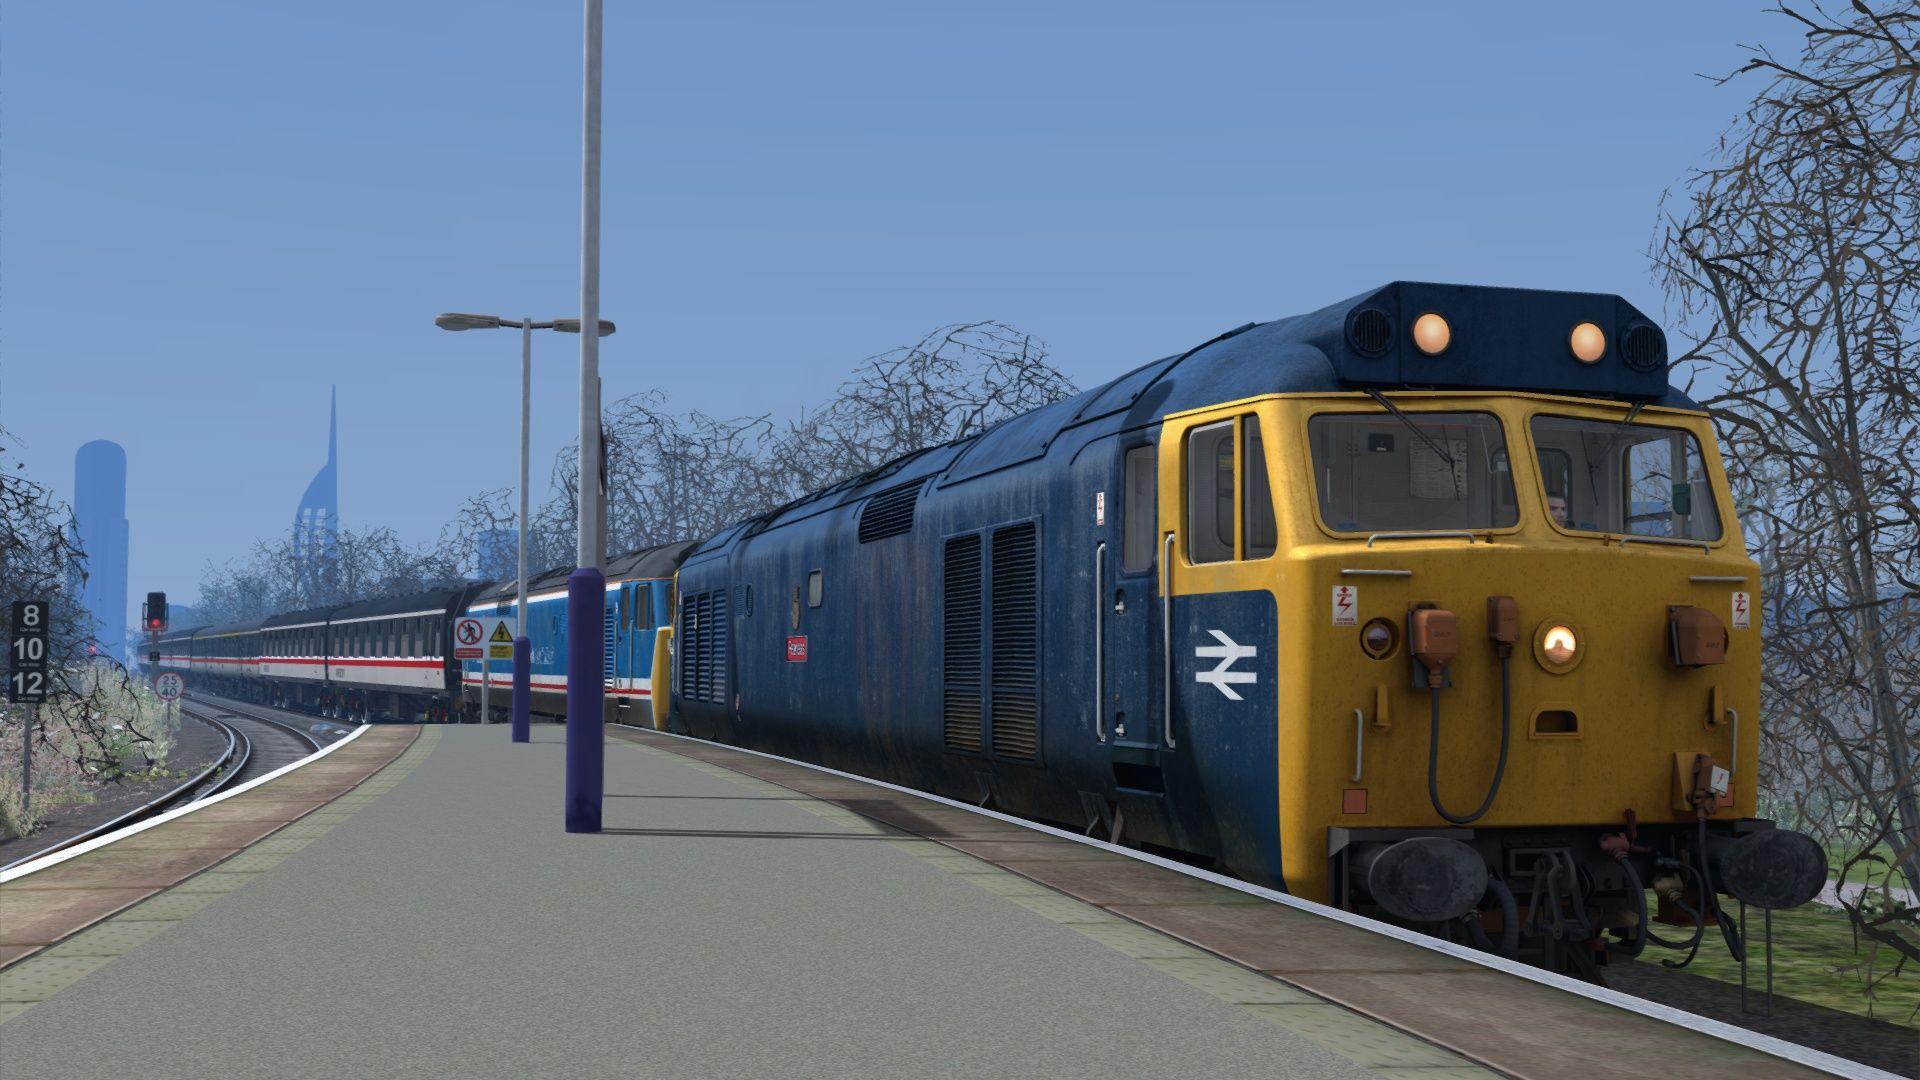 Screenshot_Portsmouth Direct Line - London Waterloo to Portsmouth_50.79830--1.09257_13-35-29.jpg